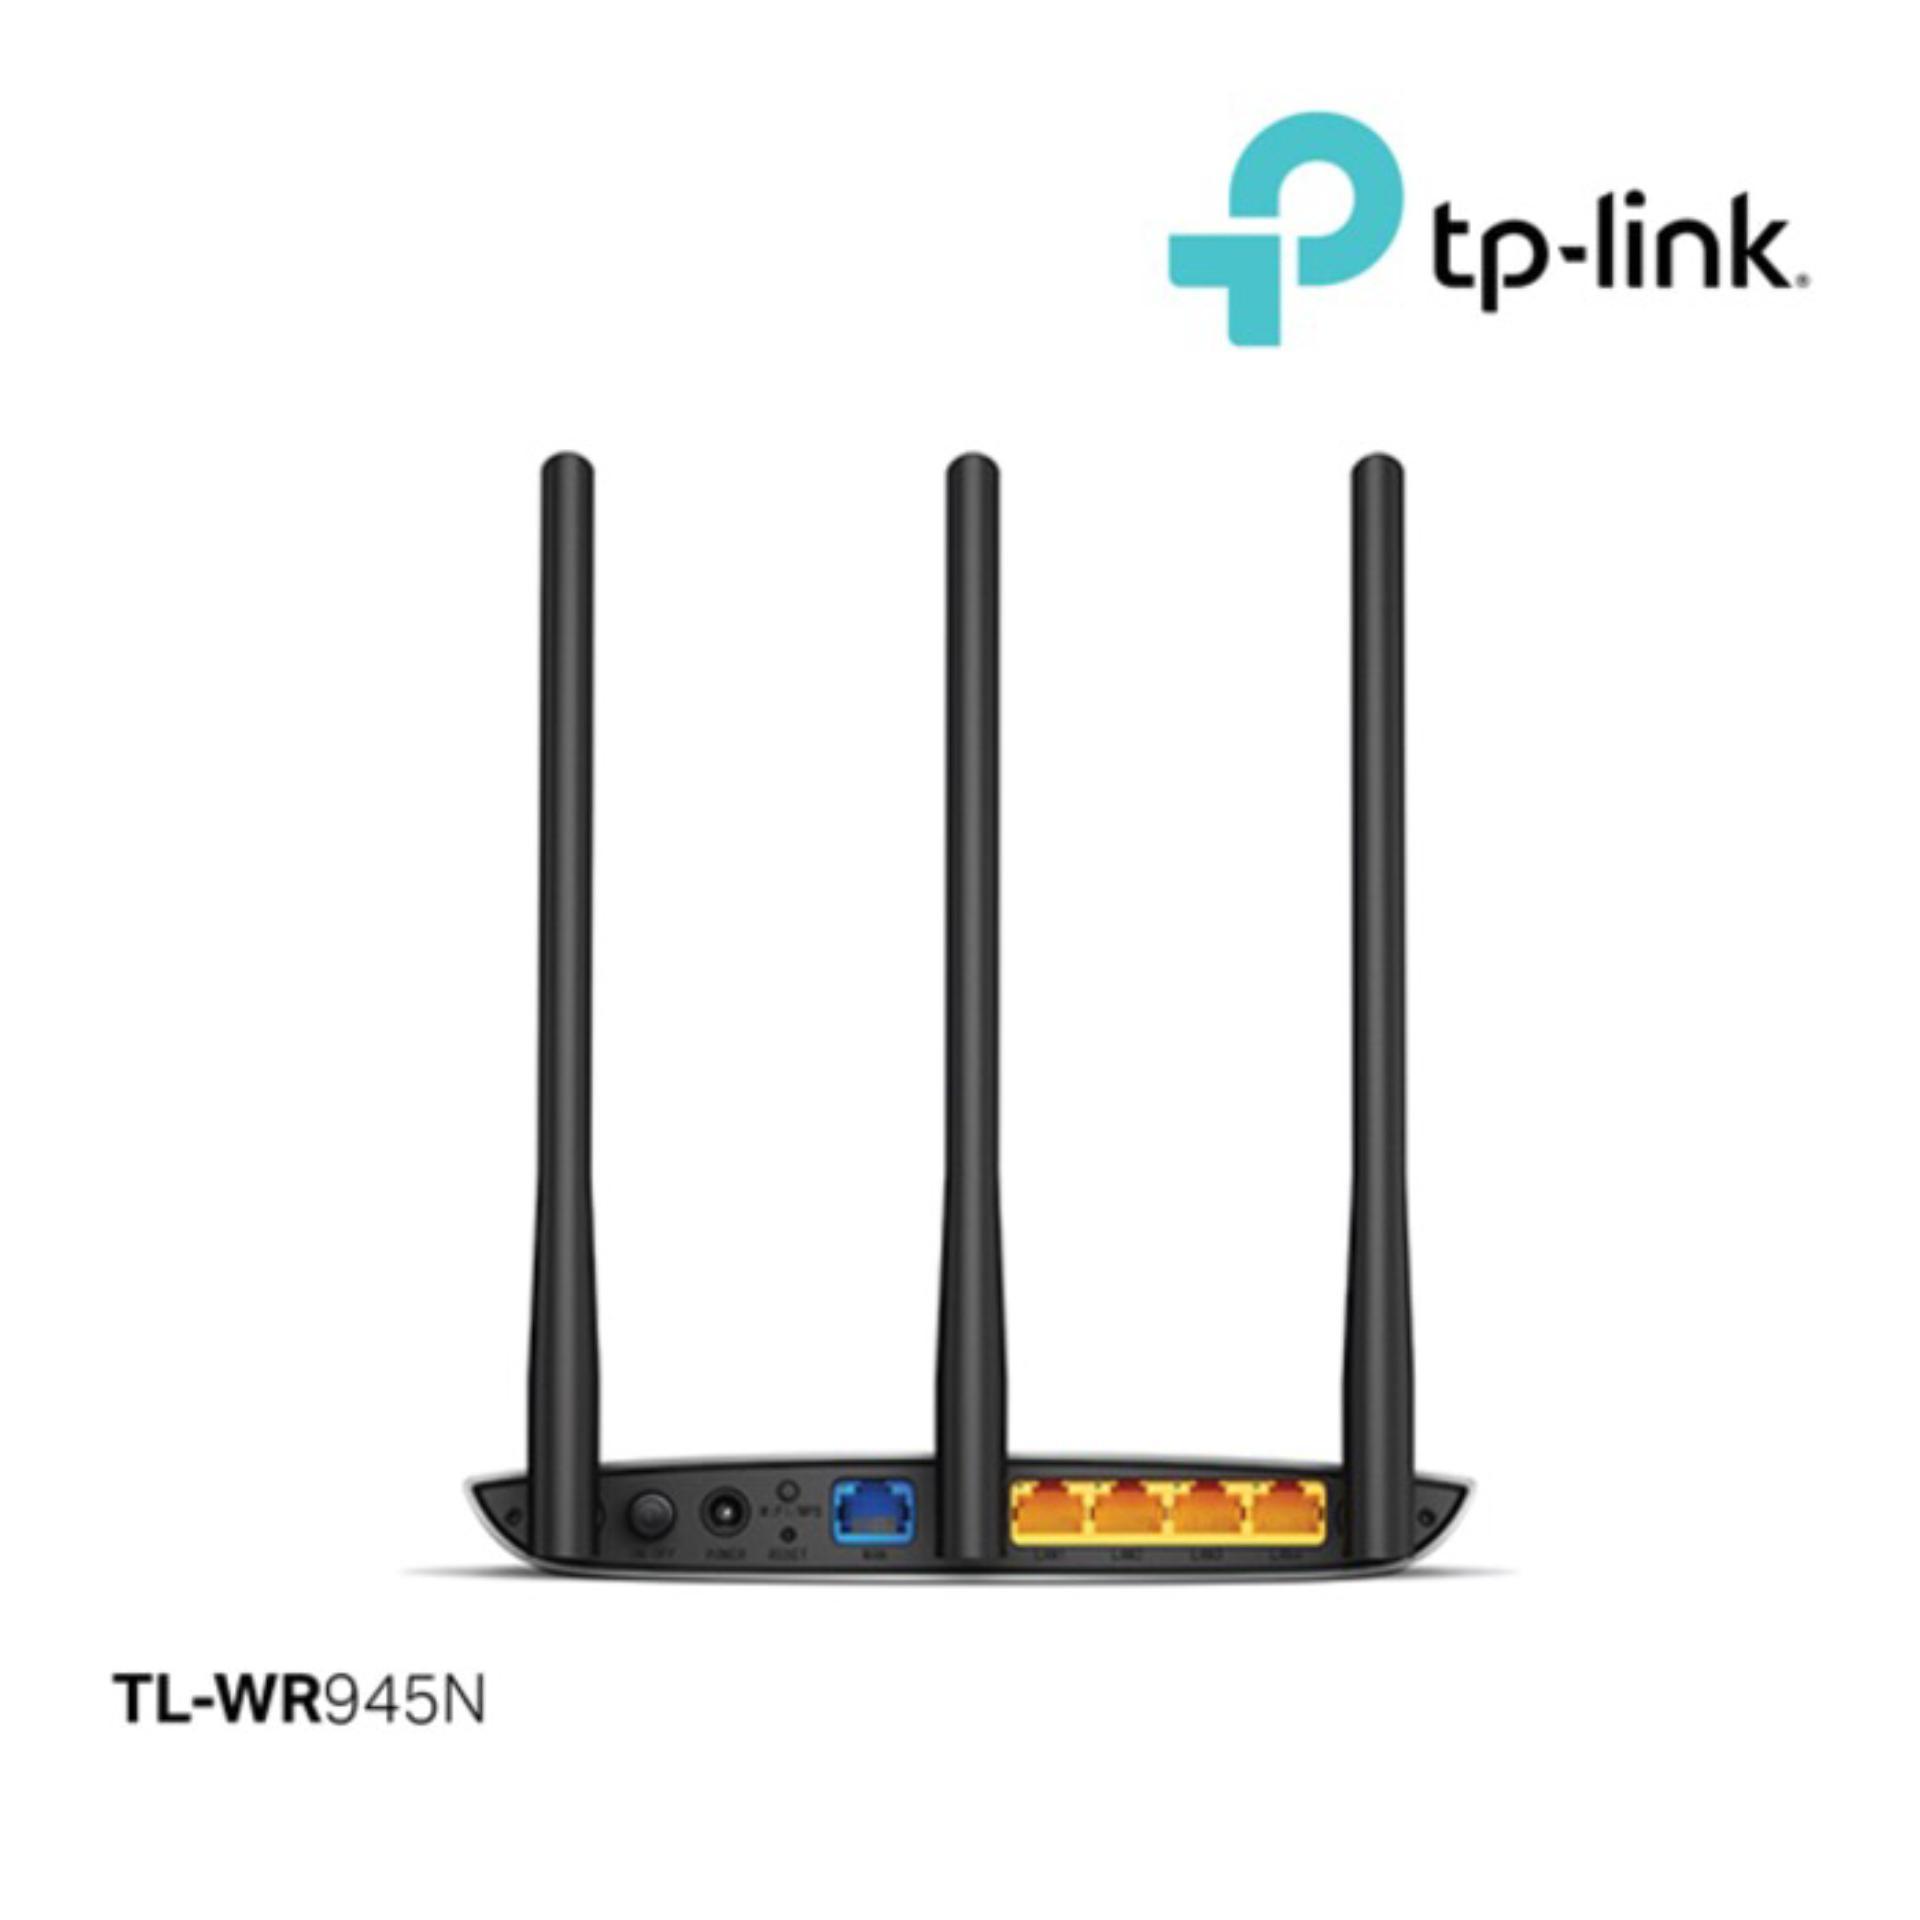 Pelacakan Harga Tplink Tl Wr945n 450mbps Wireless N Router Flash Sale Tp Link Wr941hp High Power Hitam